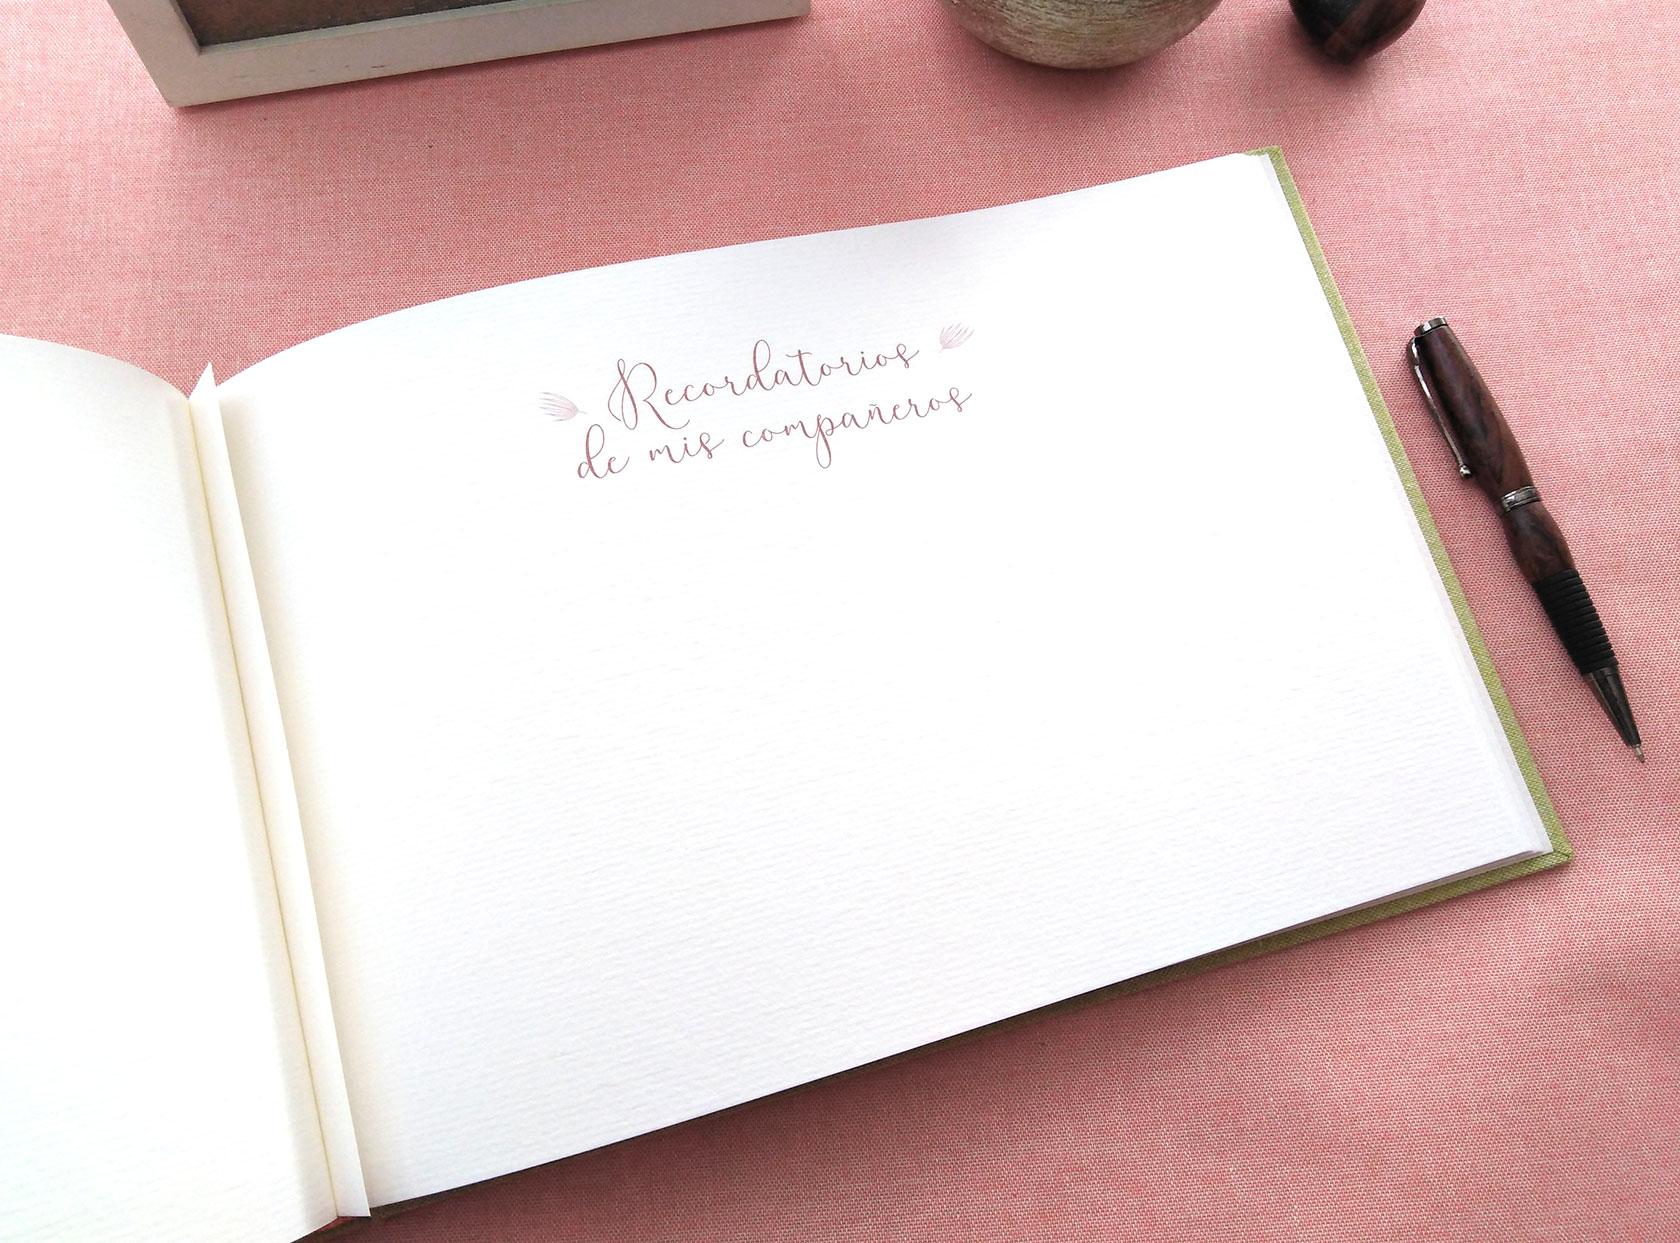 Libros de firmas<br> impresos